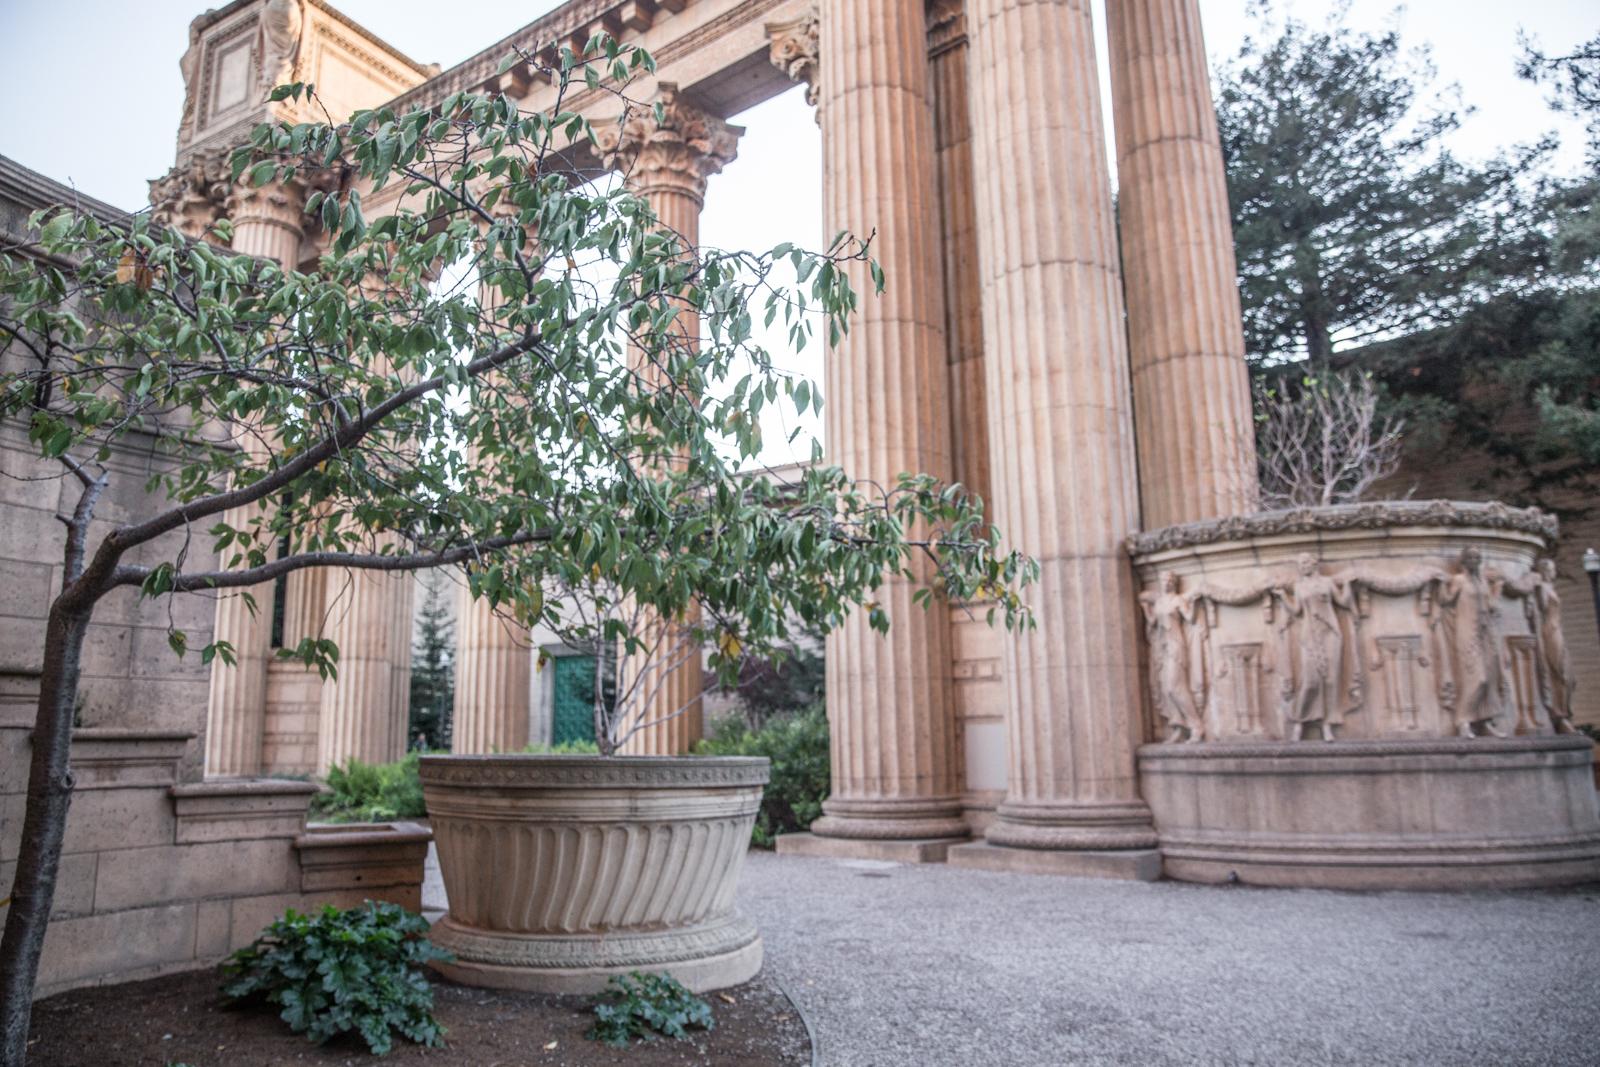 palace of fine arts san francisco-9410